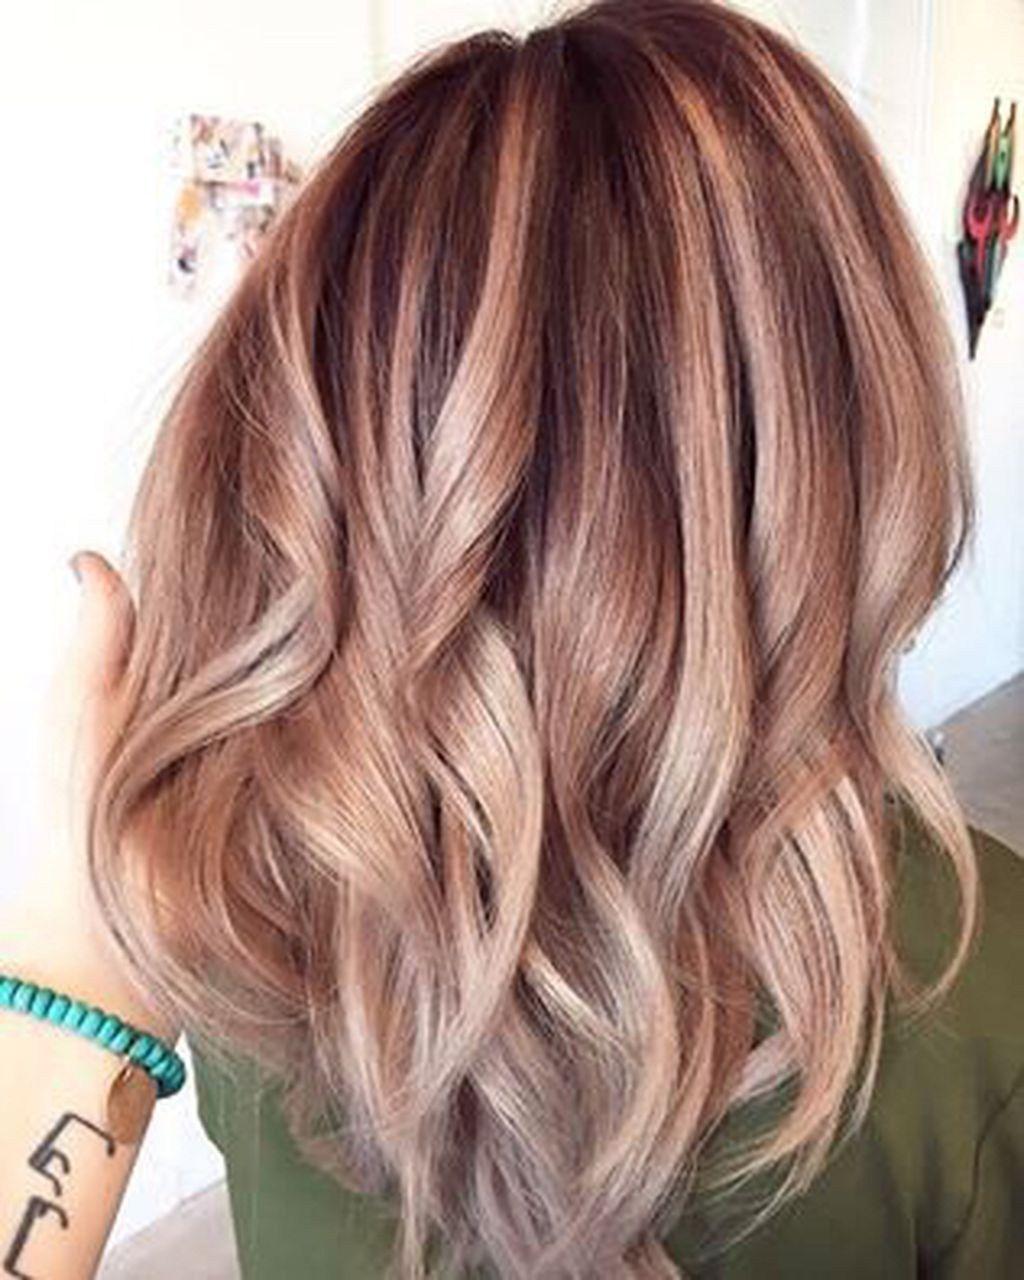 Stunning fall hair color ideas 2017 trends 32 | Haircut ...